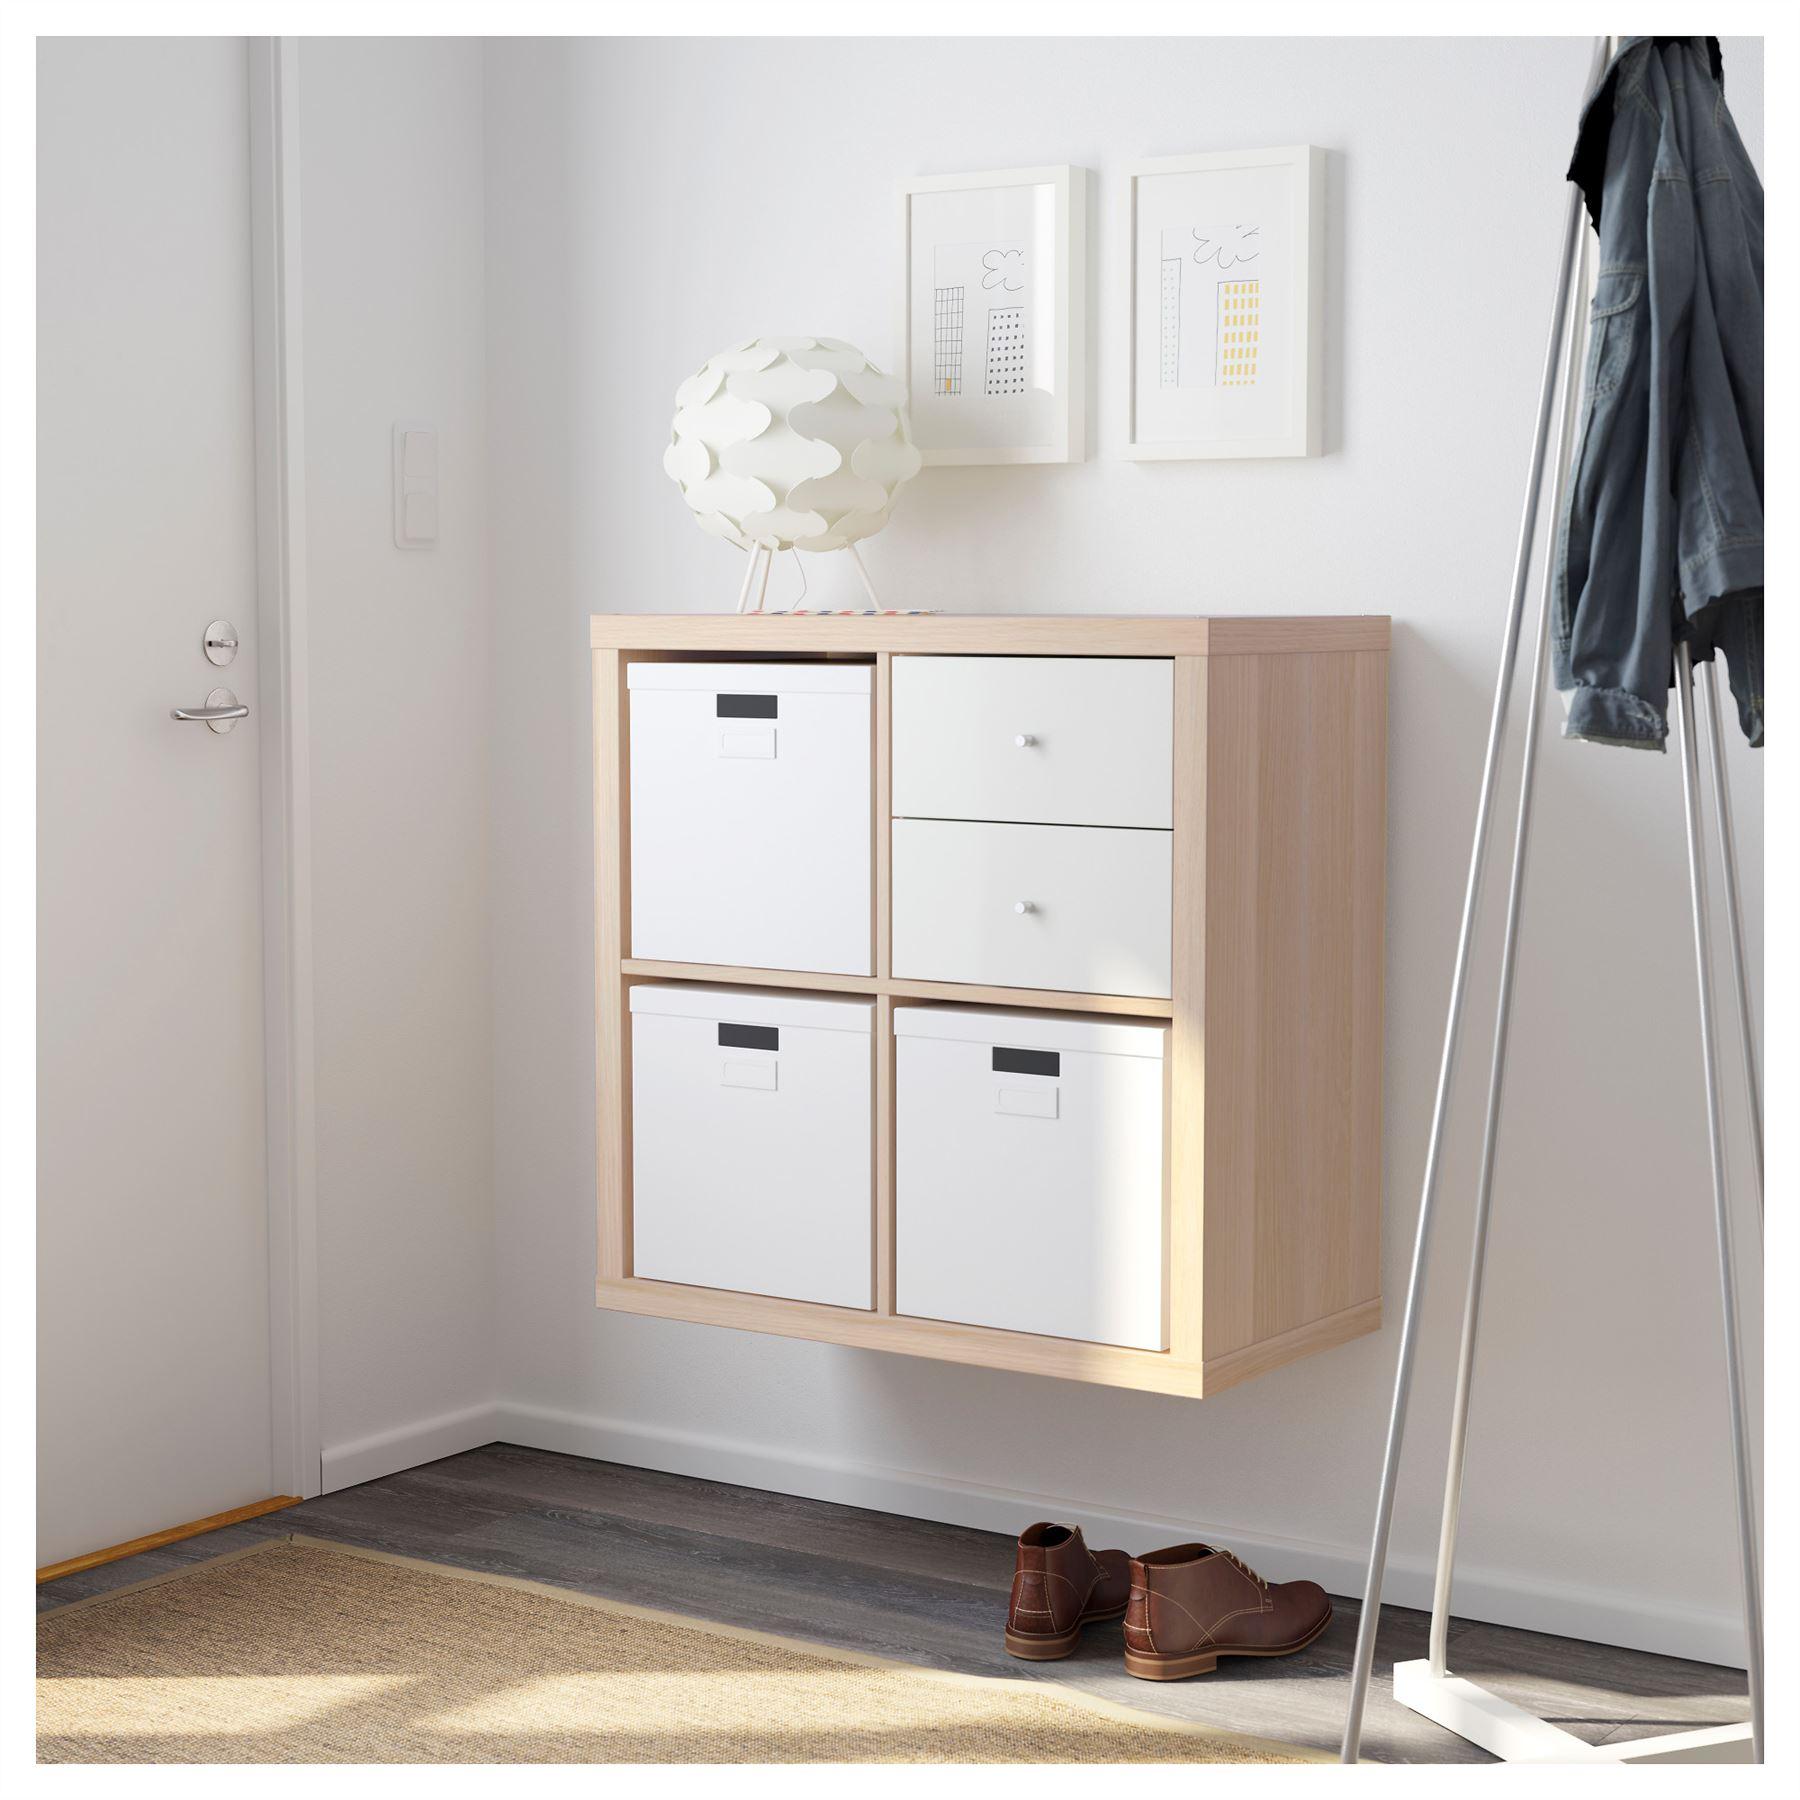 Ikea Kallax 4 Cube Storage Bookcase Square Shelving Unit